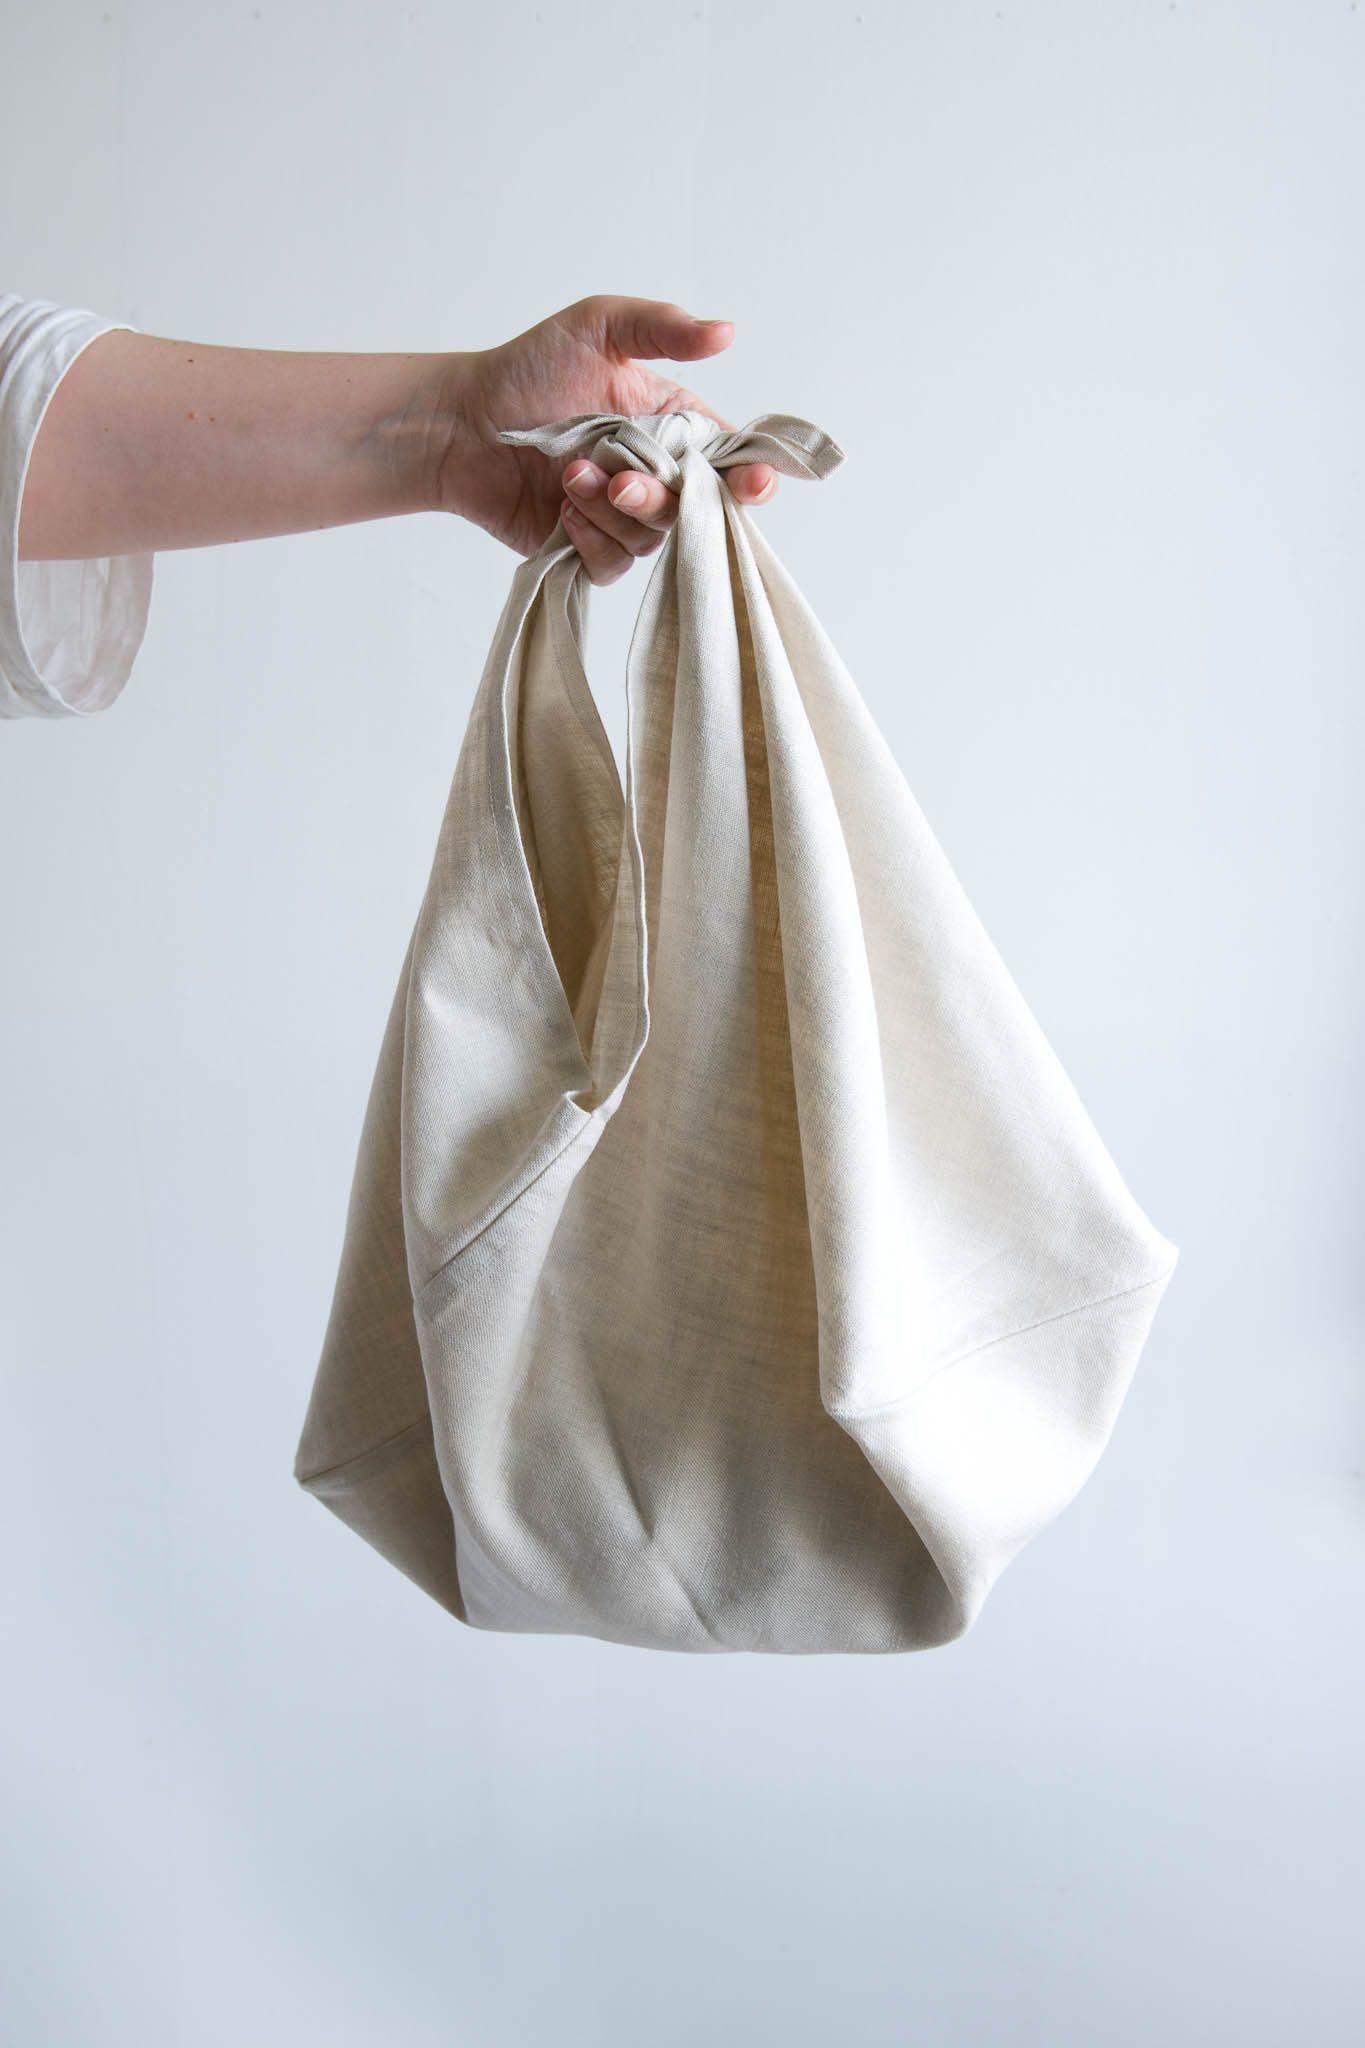 Large azuma bag origami bag triangle bag zero waste plastic free shopping bag produce bag